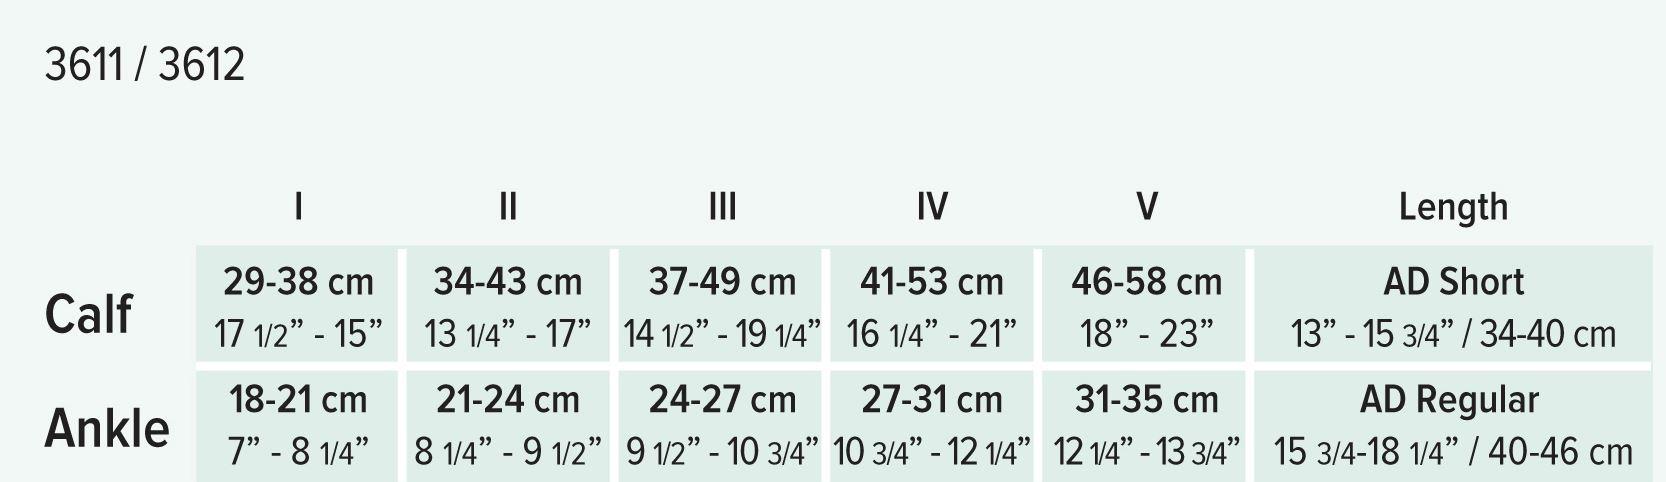 juzo-3611-3612-size-chart.jpg